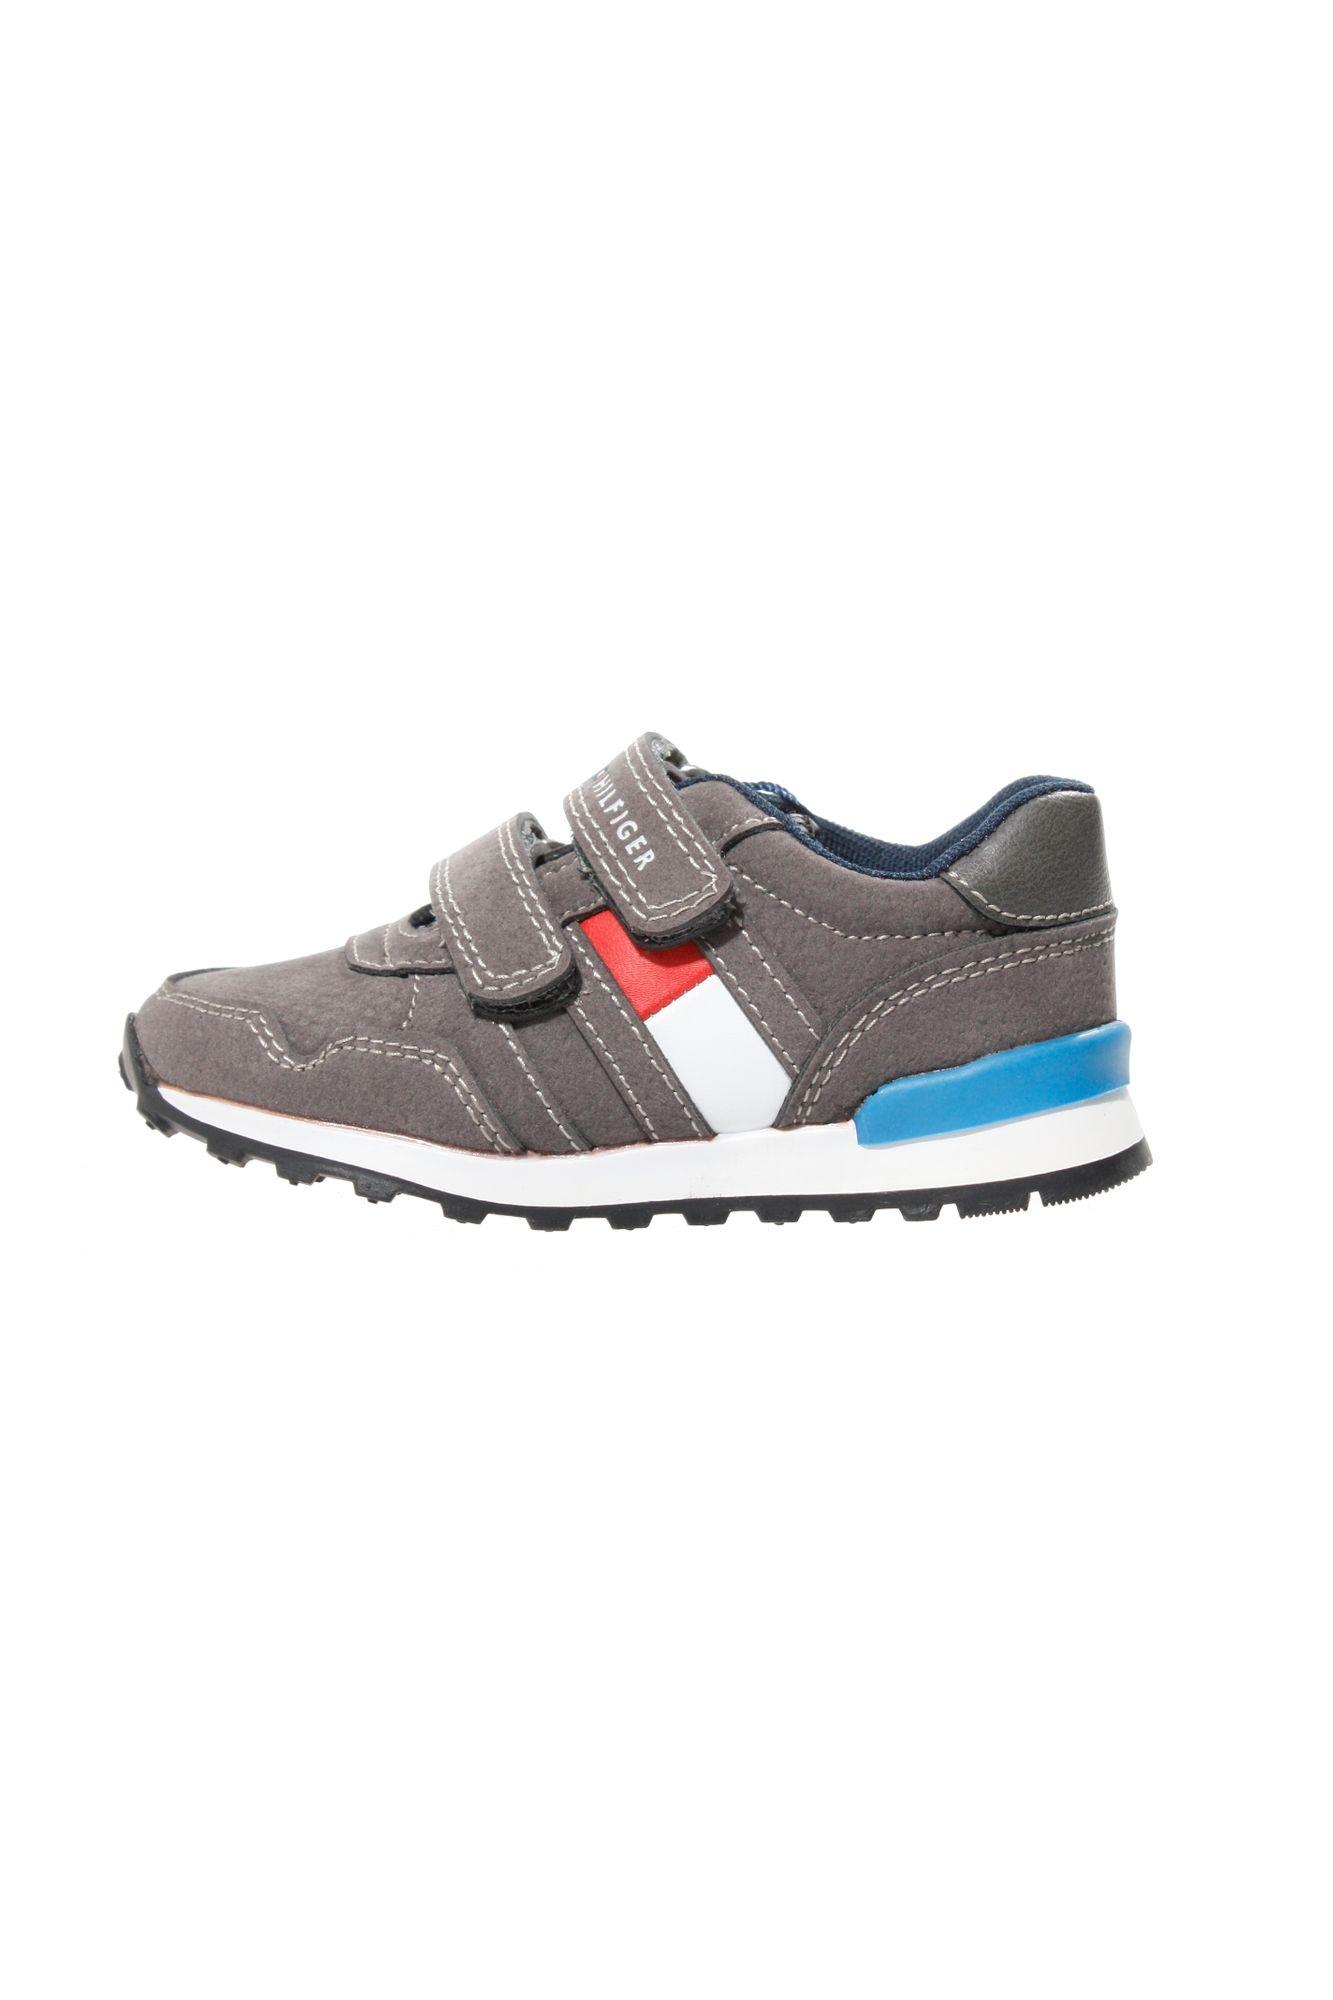 huge discount da60c 847f0 Tommy Hilfiger Kinder Sneaker Sport- Schuhe unisex T1B4-30075-0315900